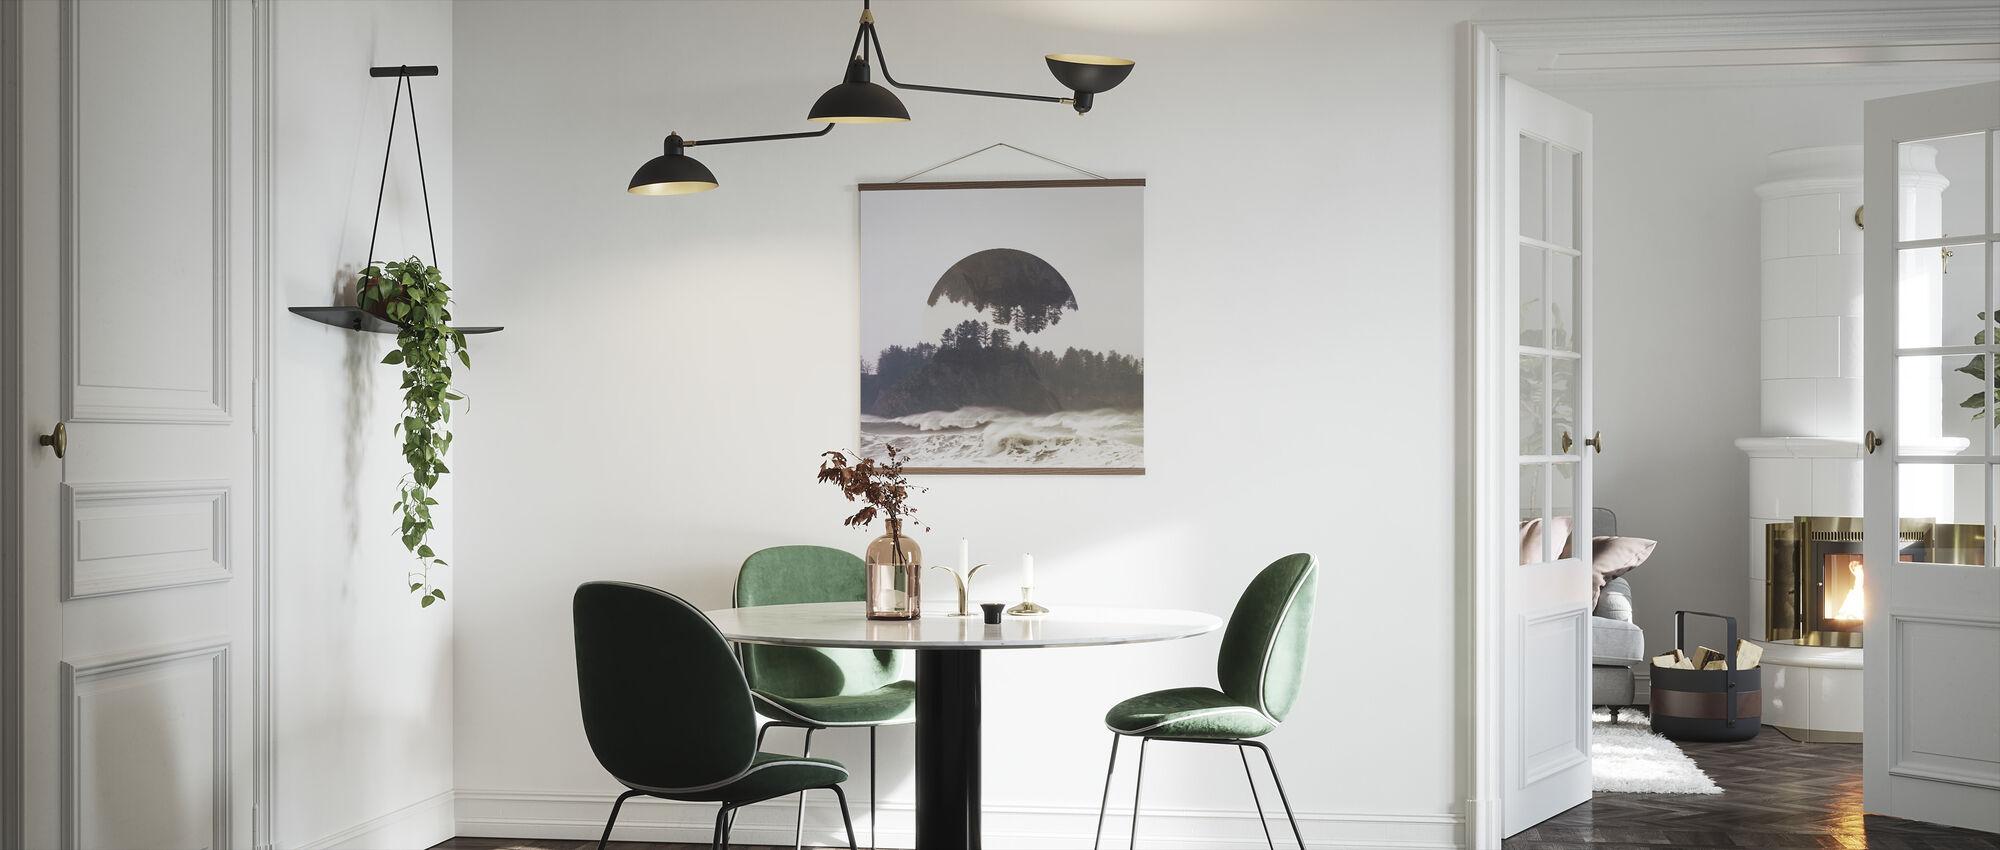 Reflected Landscape 1 - Poster - Kitchen